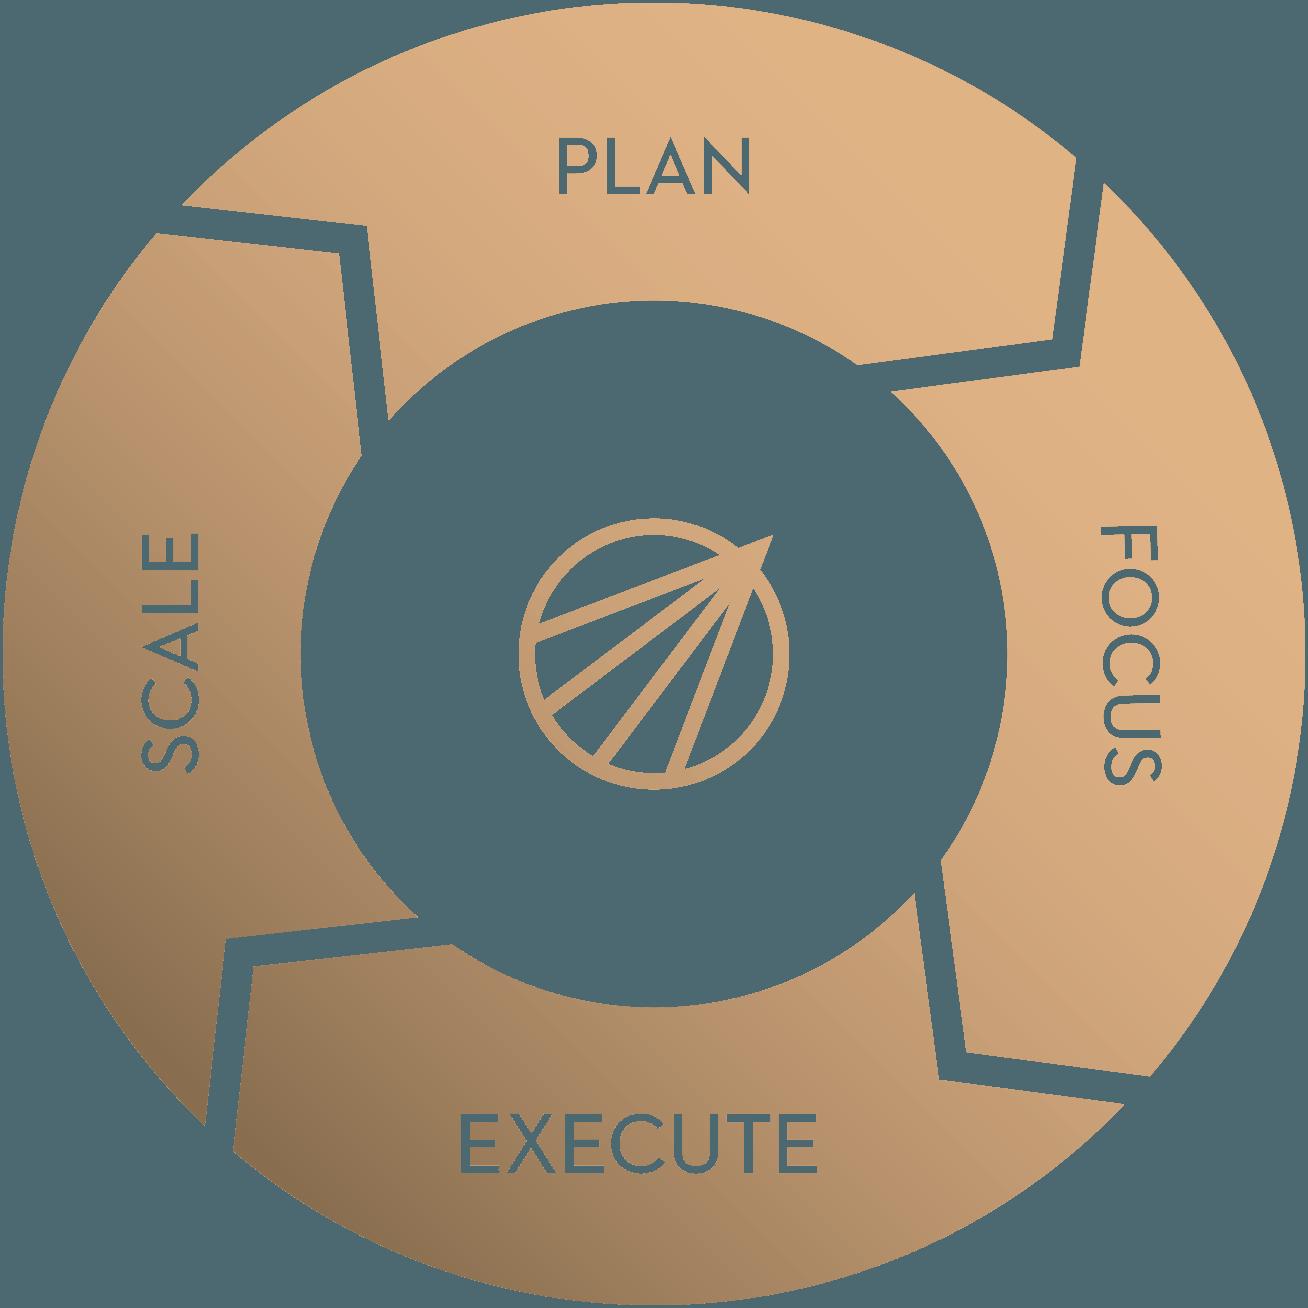 Scale, Plan, Focus, Execute